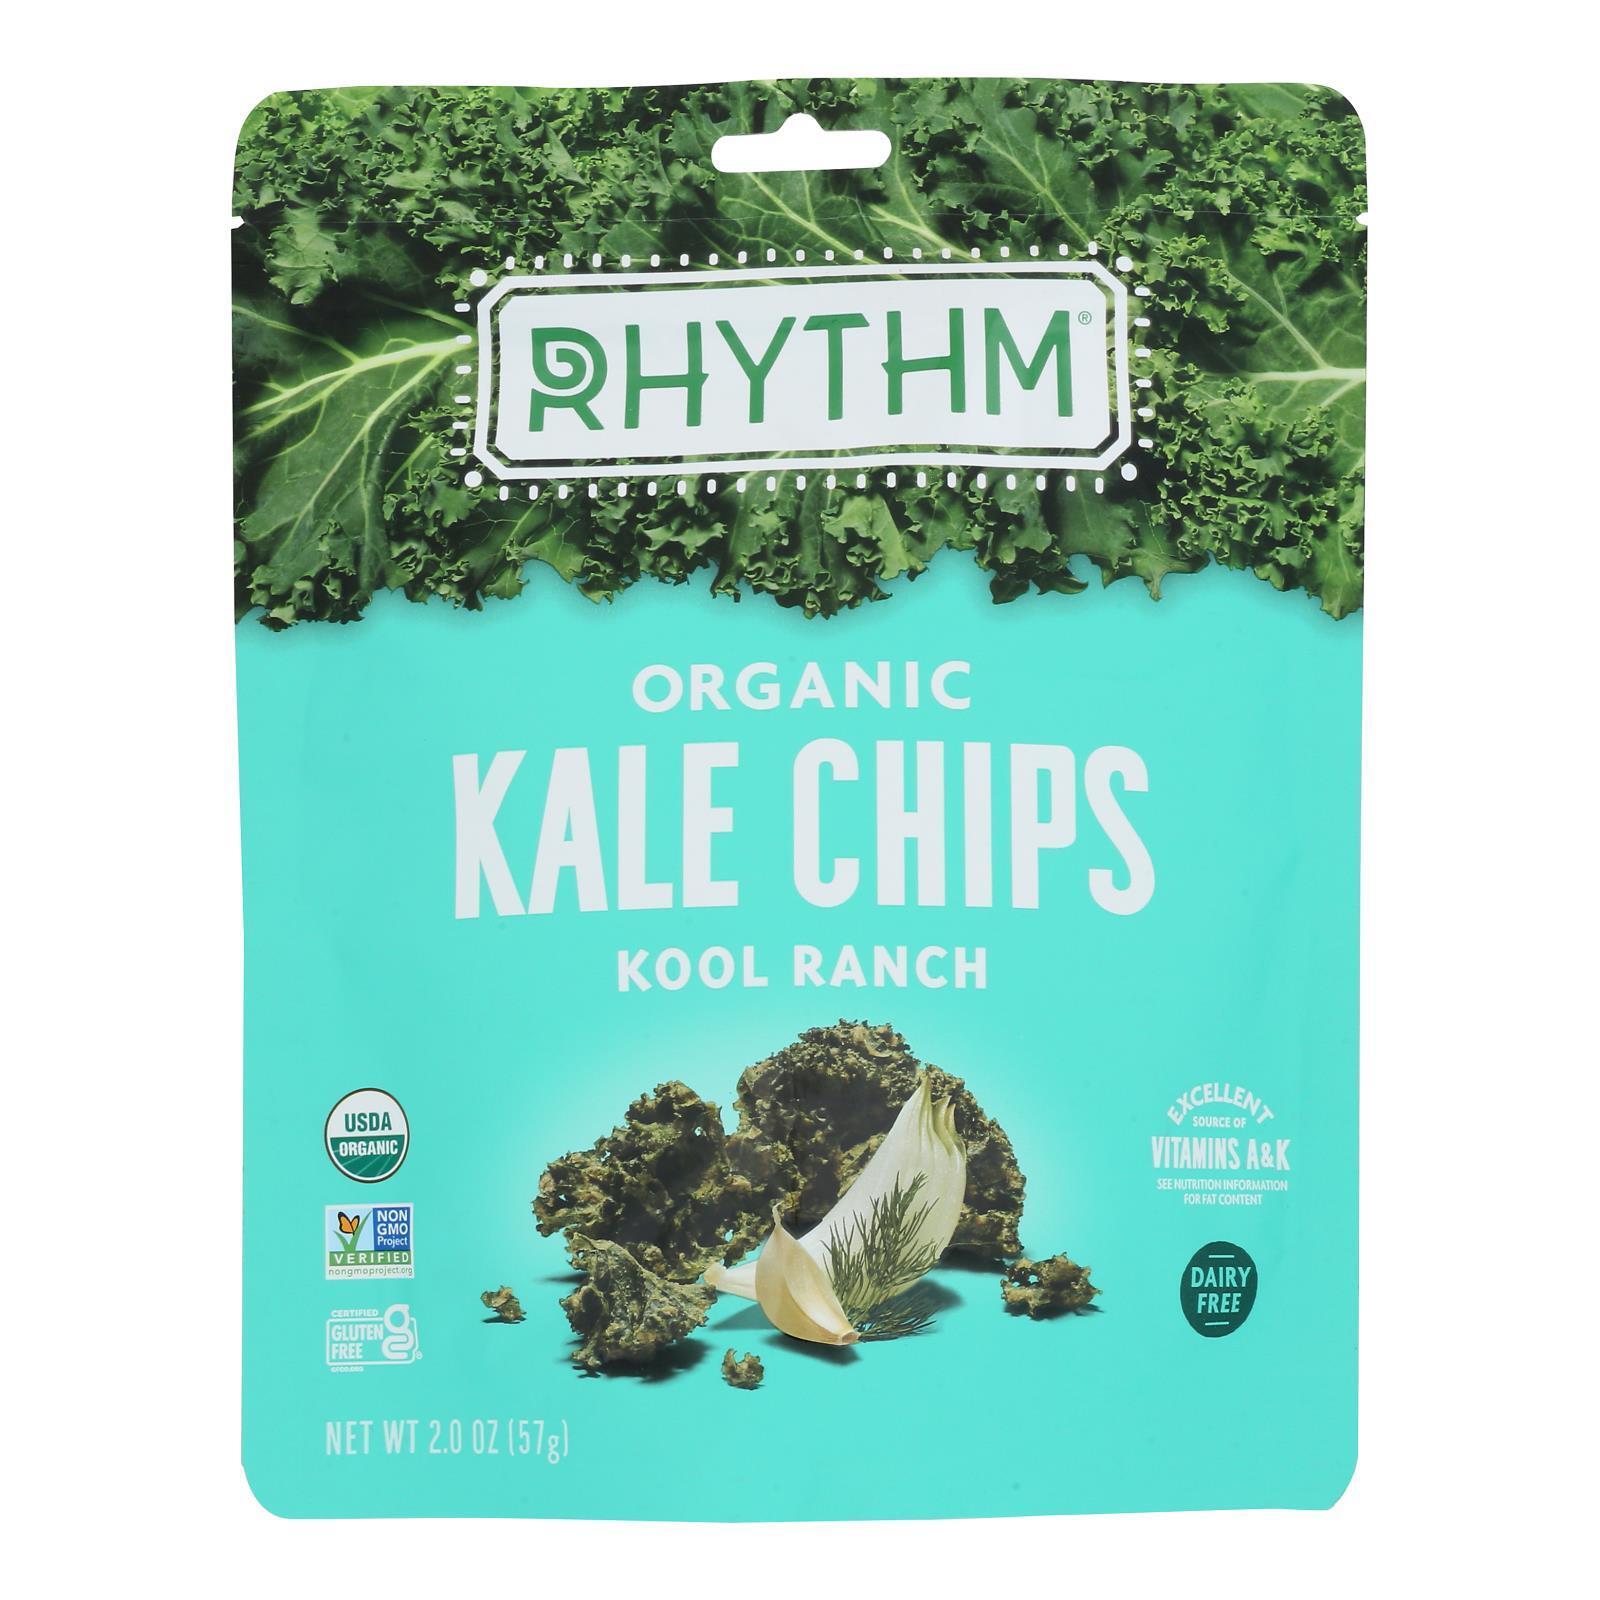 Rhythm Superfoods Kale Chips - Kool Ranch - Case of 12 - 2 oz.